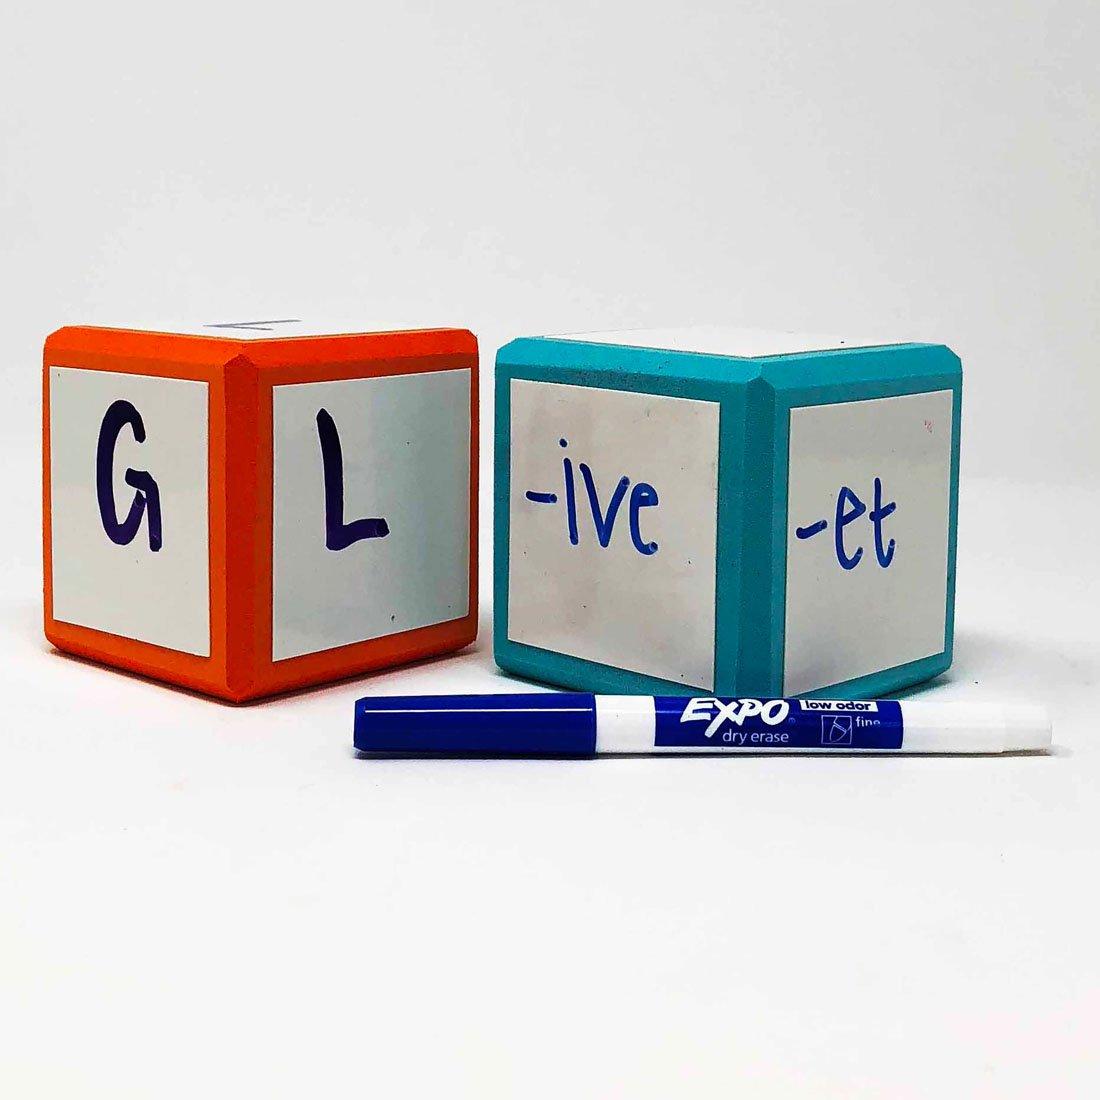 vocabulary-dice-written-in-fine-expo-marker.jpg